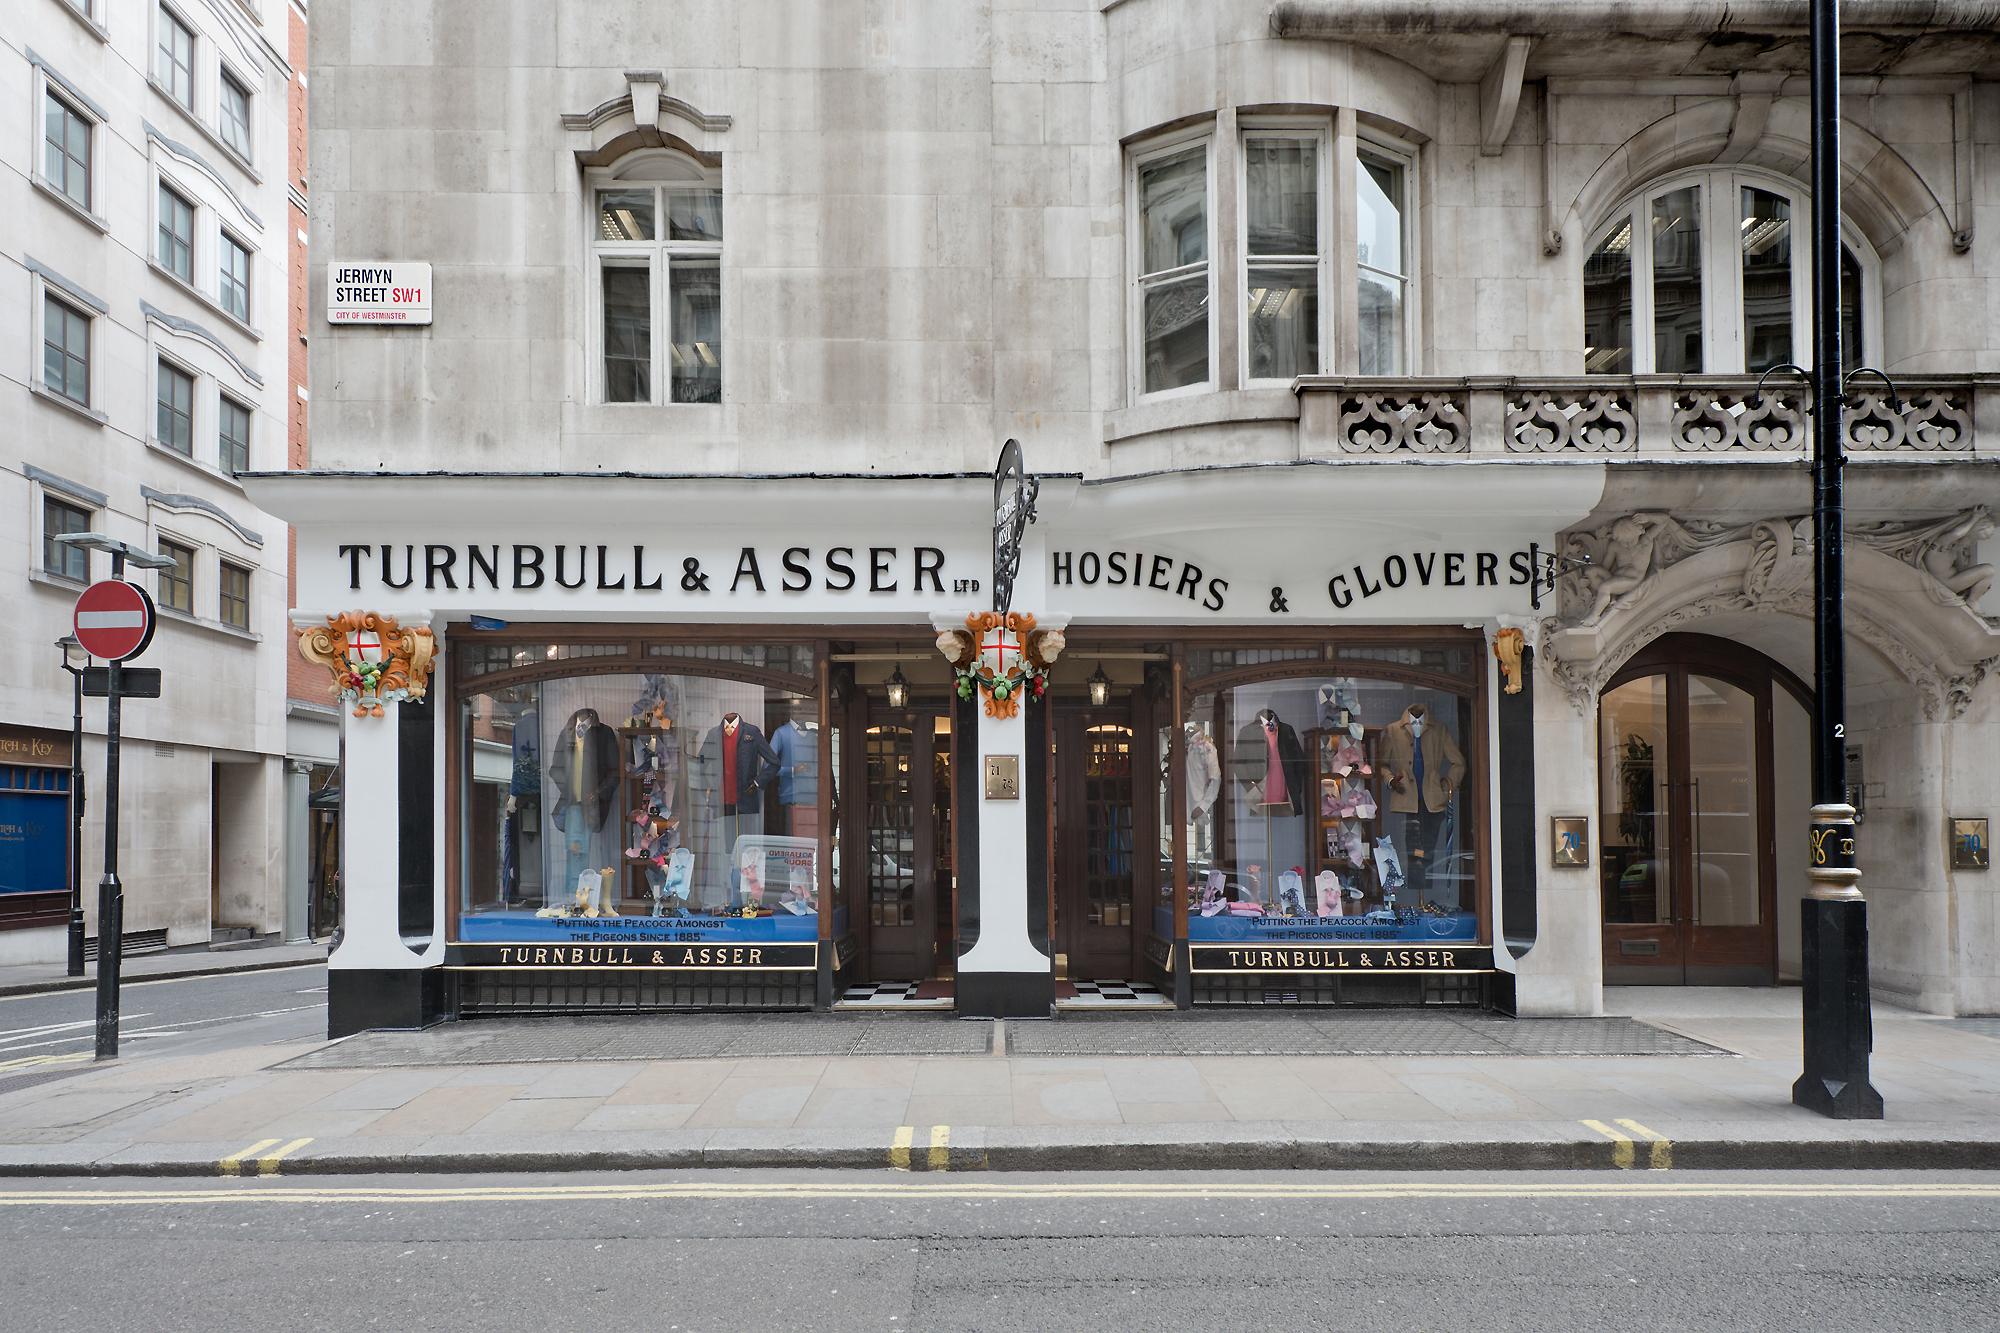 Turnbull & Assers berømte facade ud mod Jermyn Street